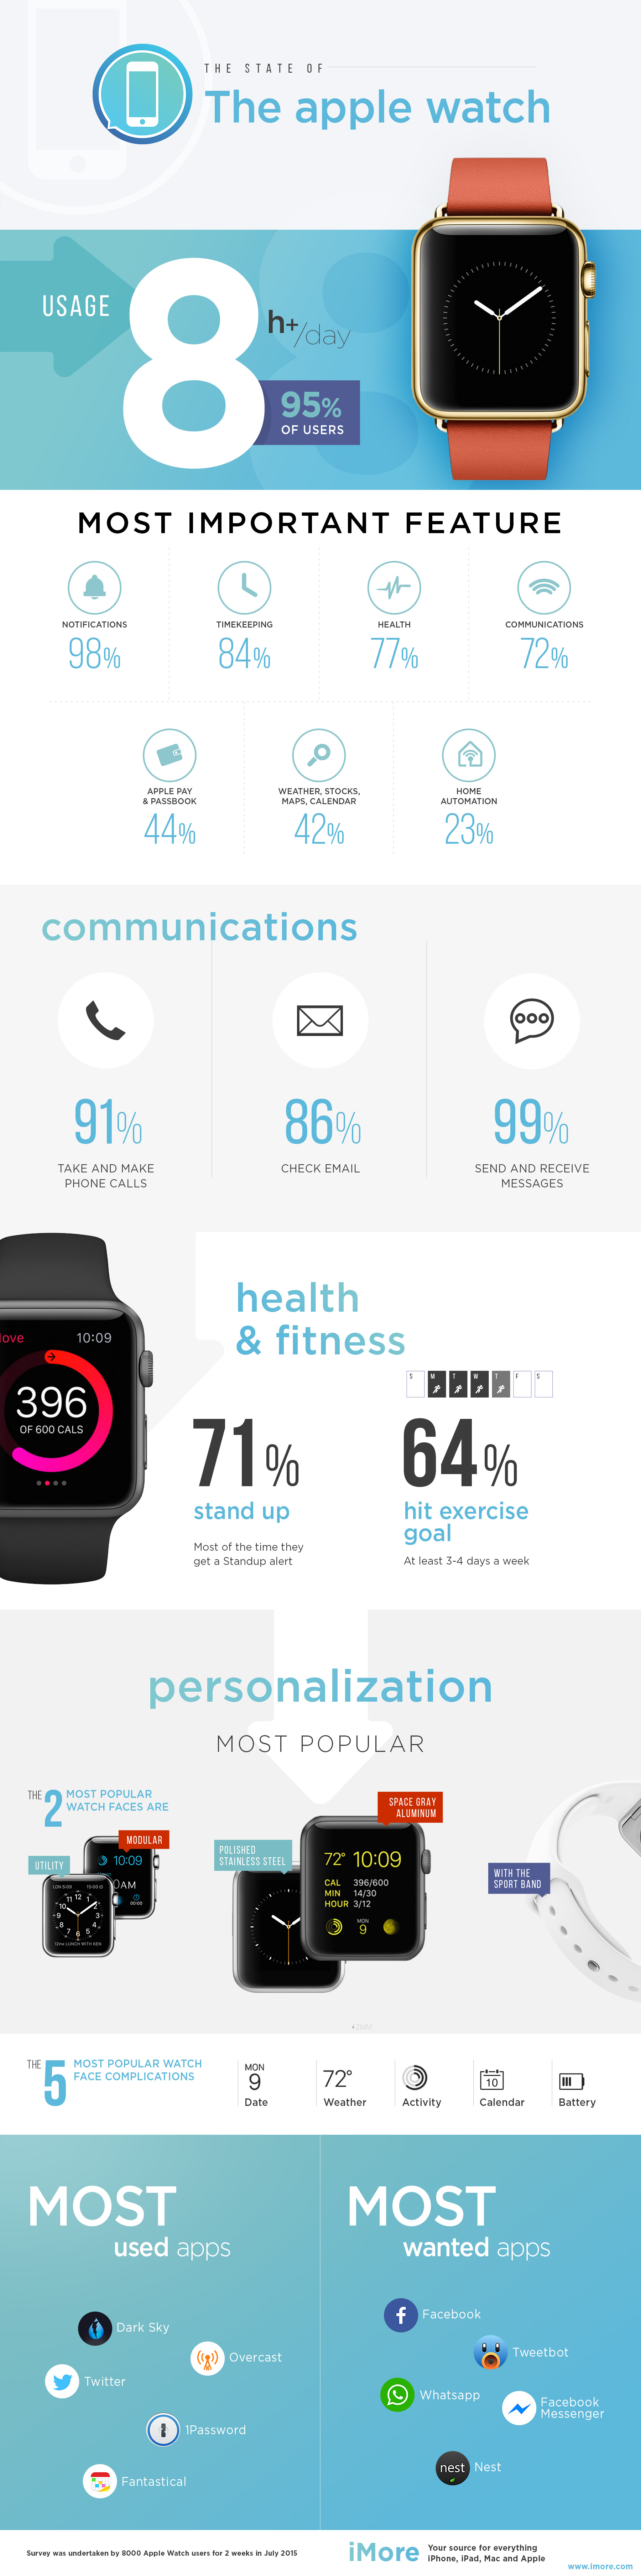 Infográfico sobre o uso do Apple Watch